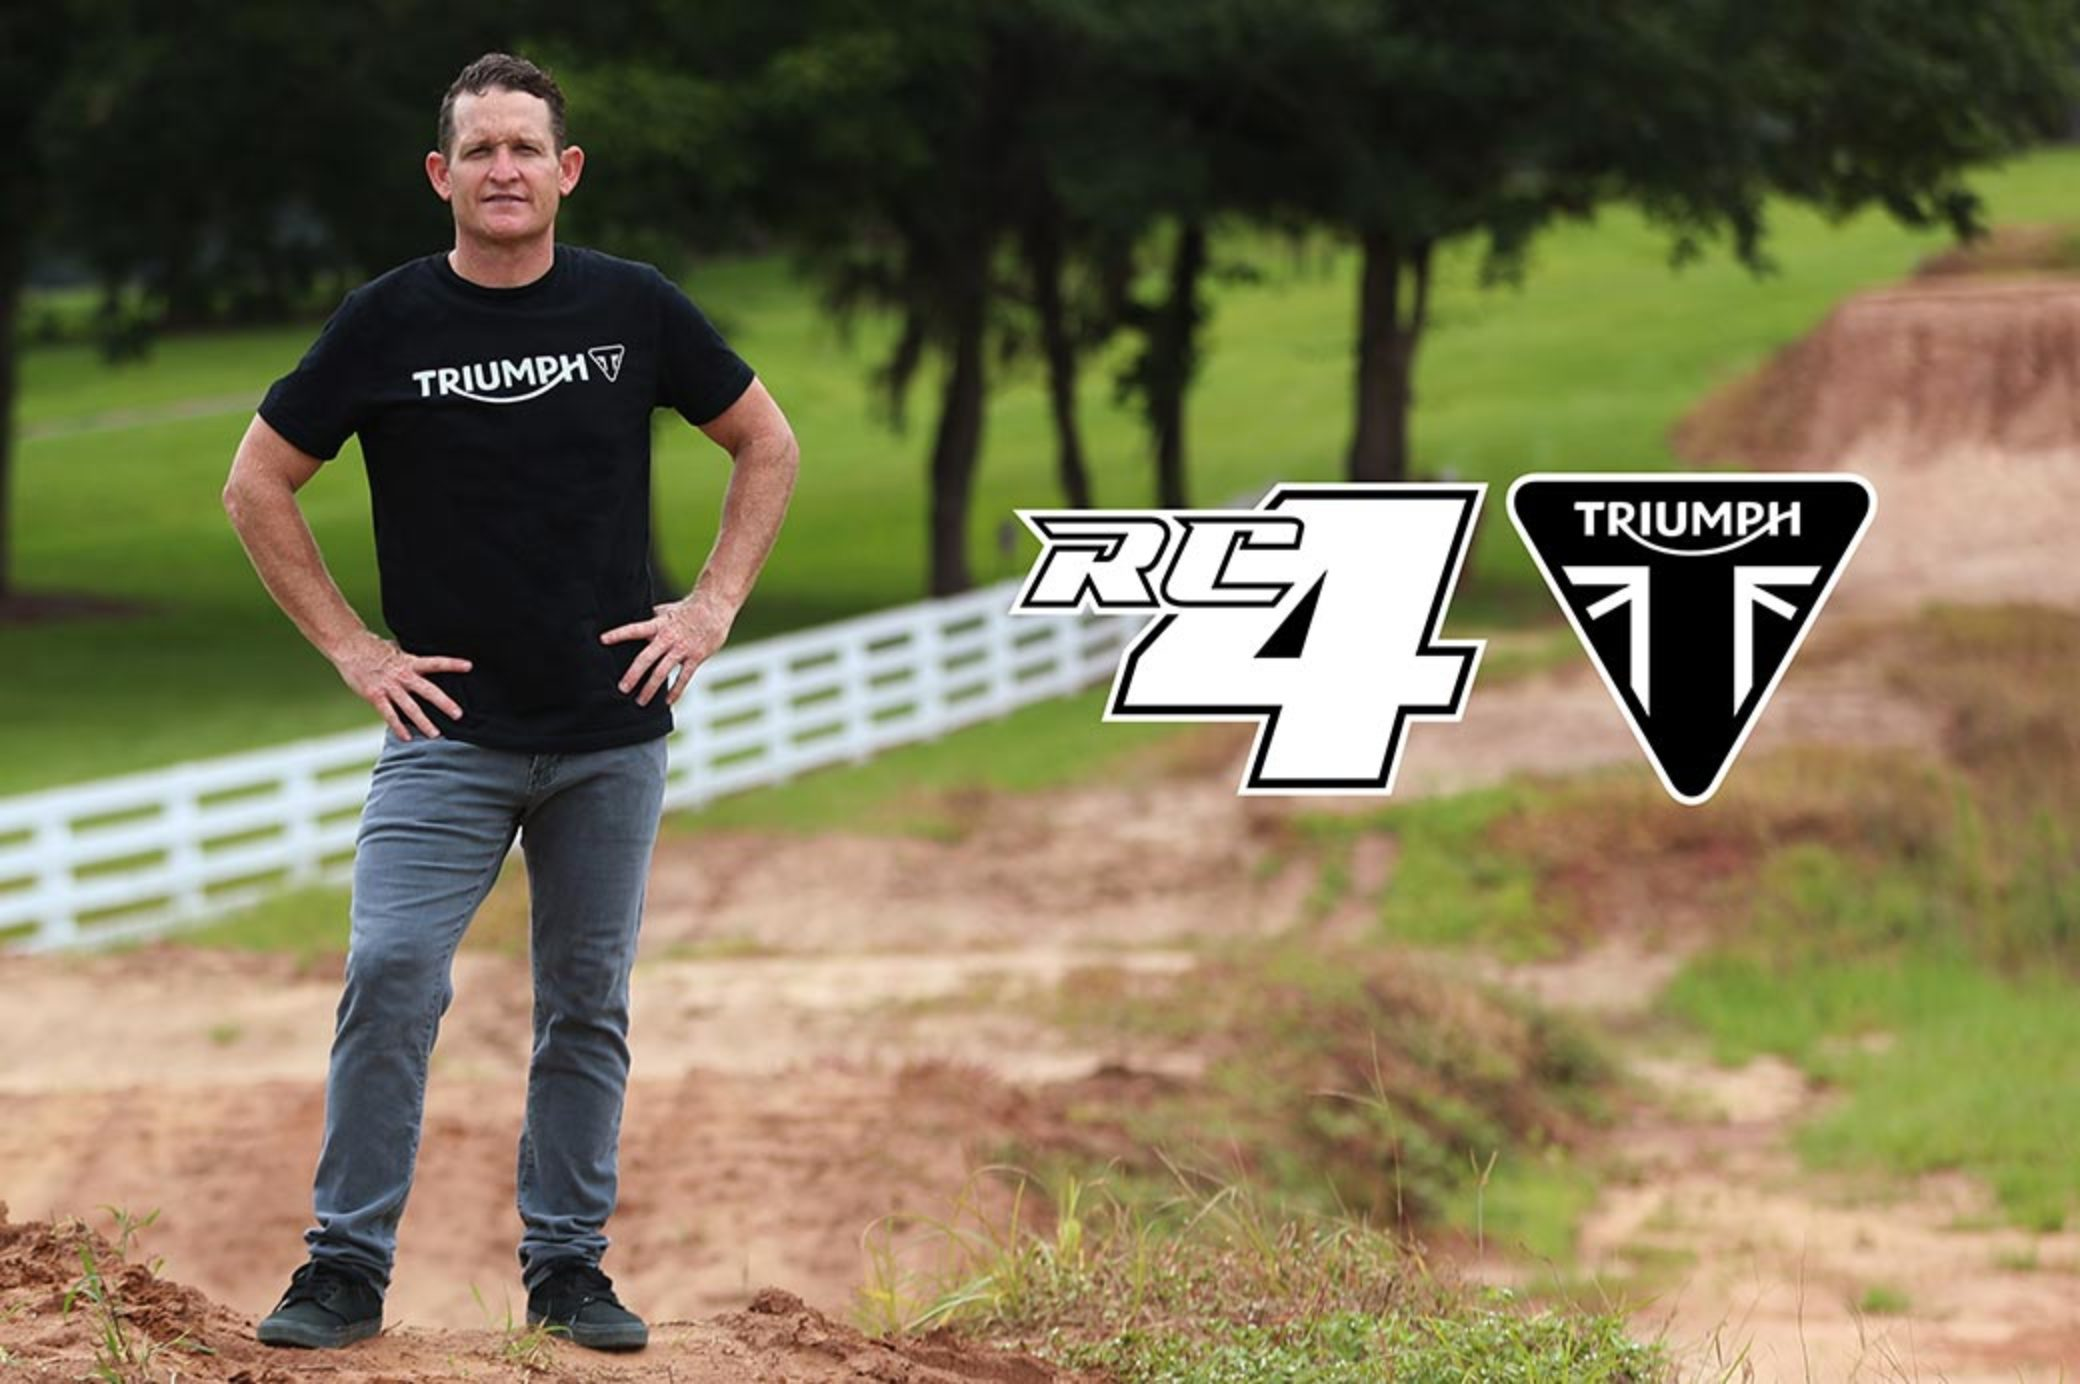 a hero of Ricky Carmichael, posing for the Carmichael/Triumph partnership